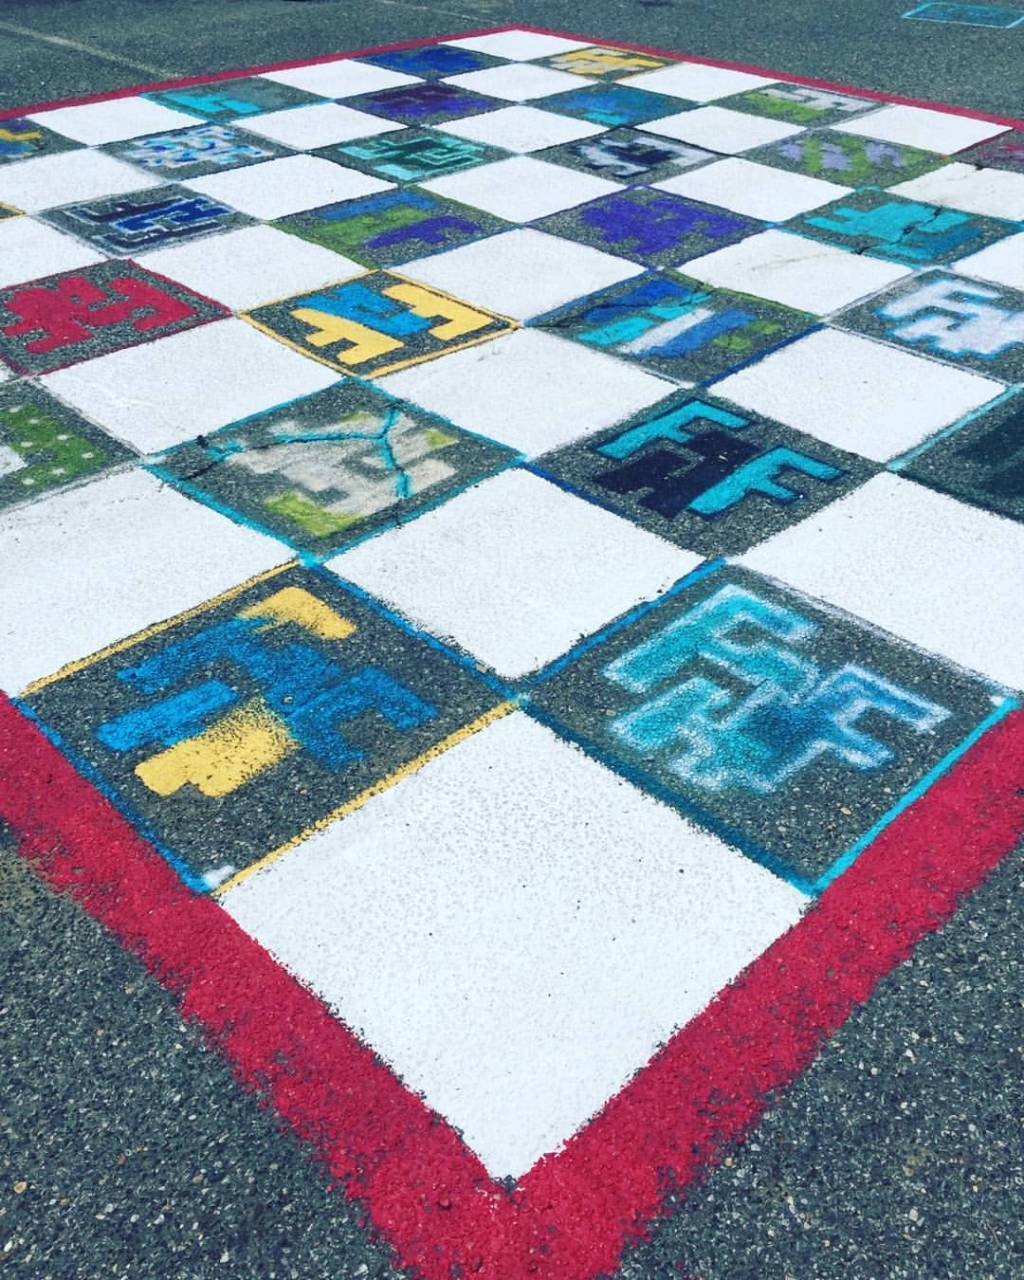 LOT 323 chess board